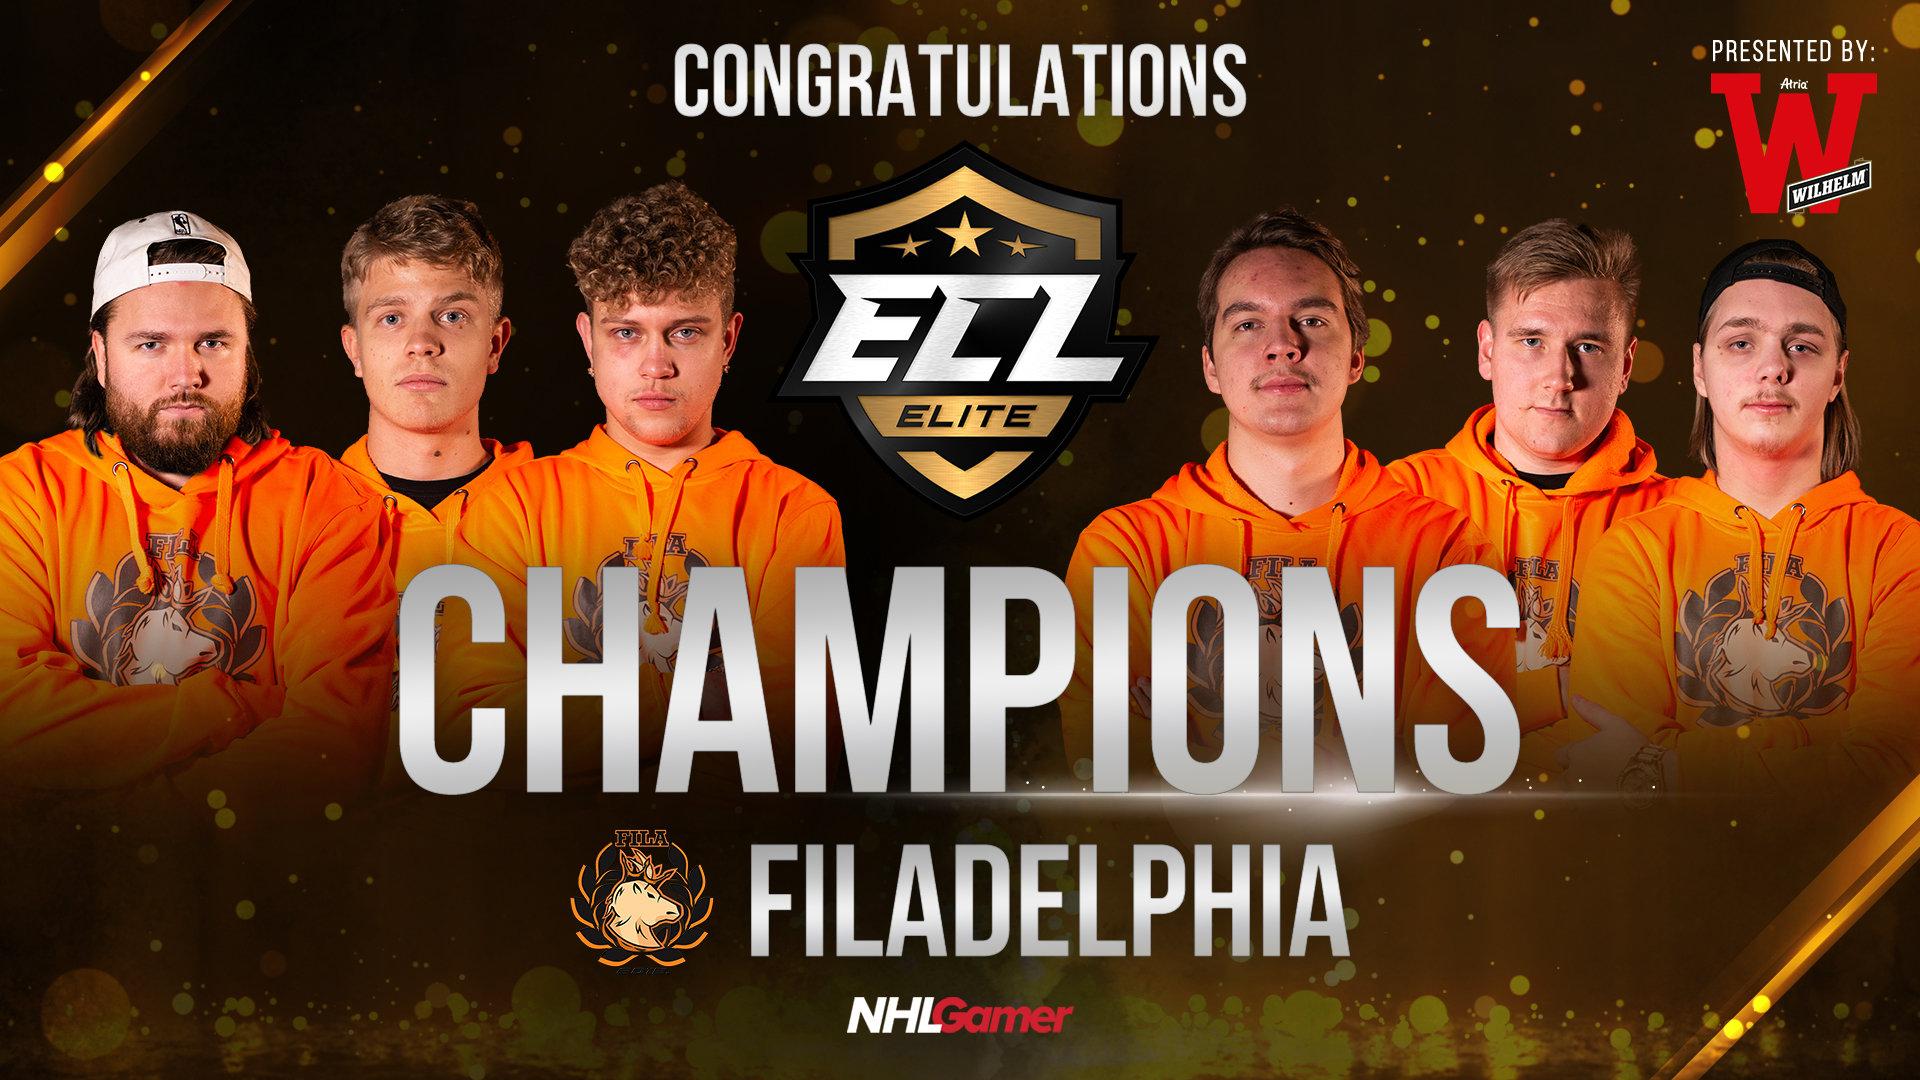 ECL_11_Elite_Champions_FILADELPHIA_cover